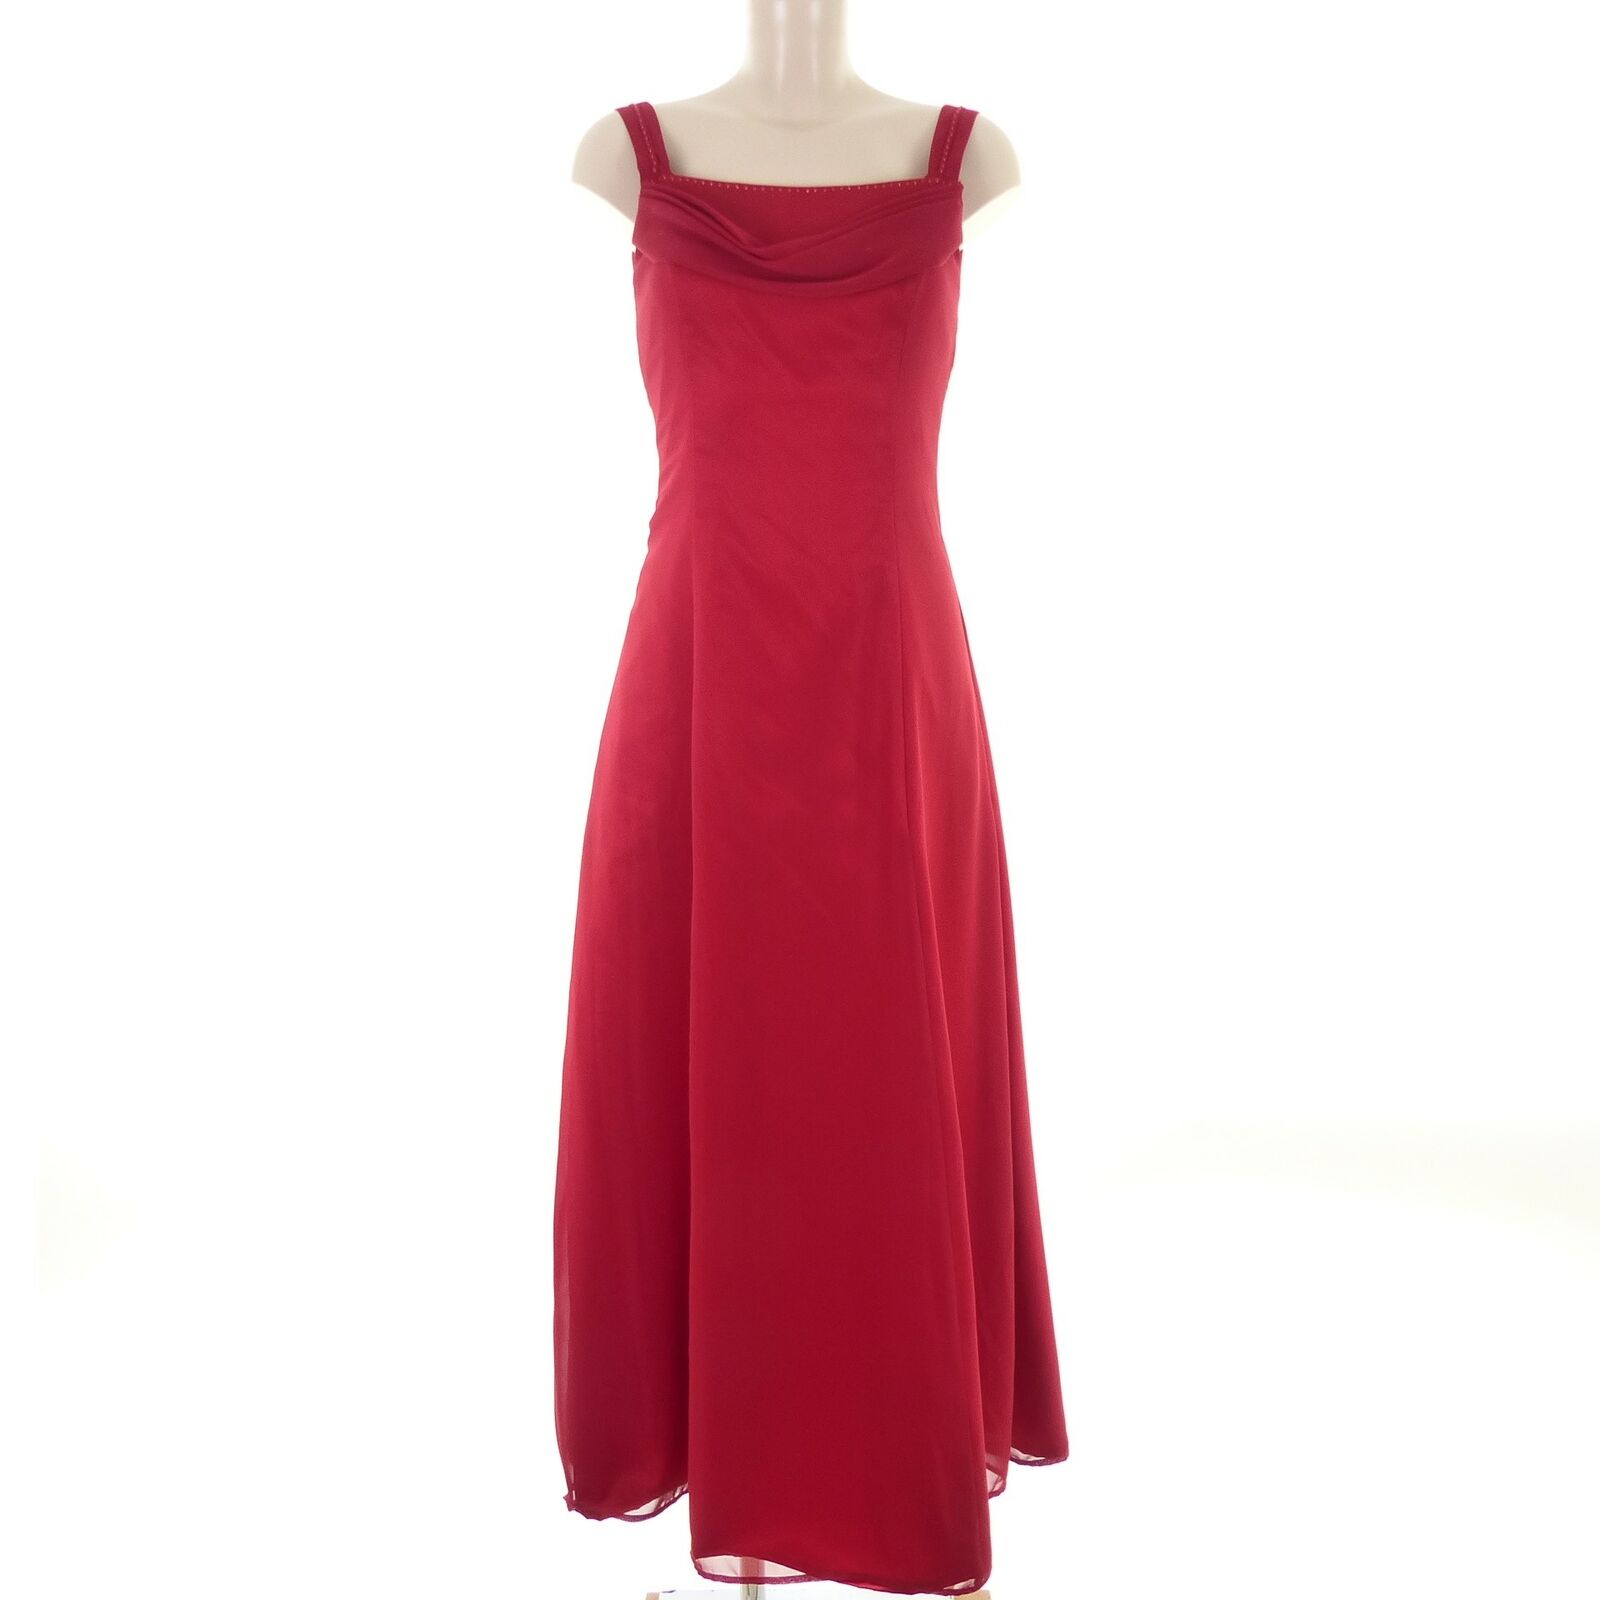 d.m.fashion abendkleid maxikleid dress robe rot red gr. 38 m